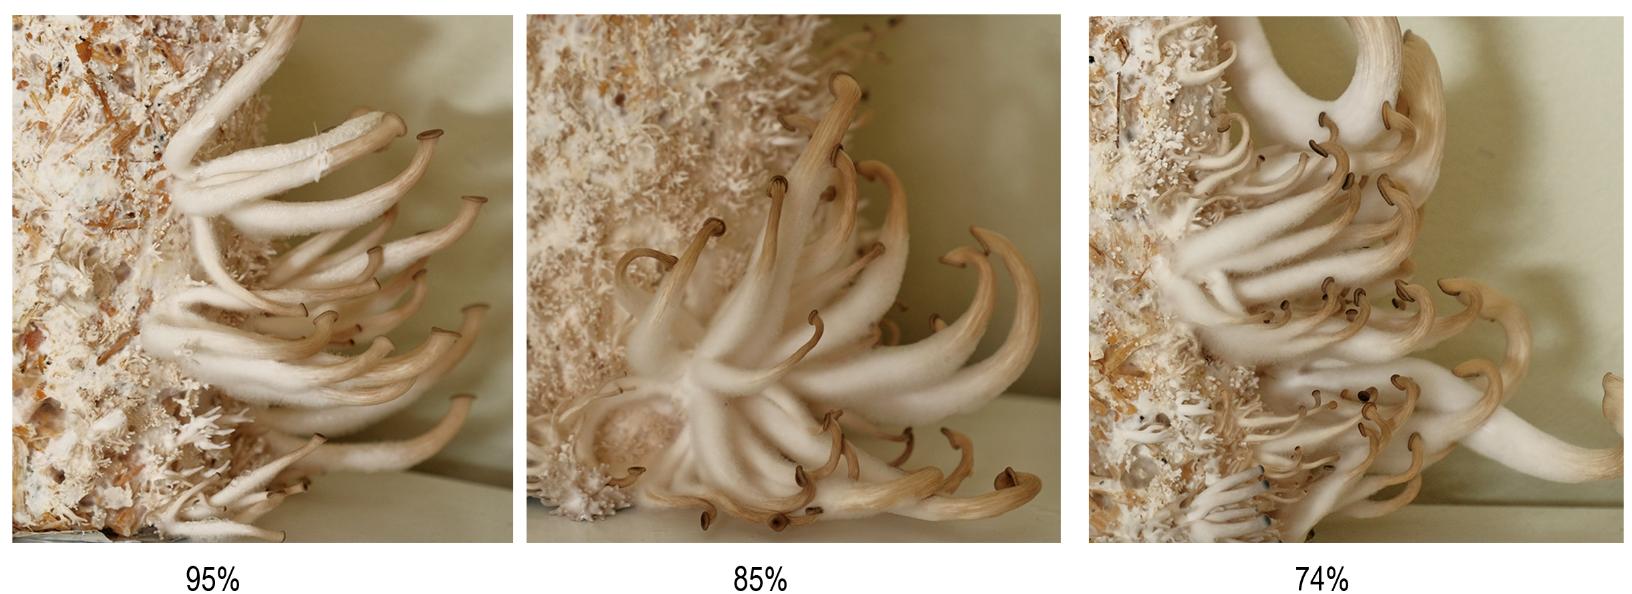 The effect of humidity on mushroom morphology